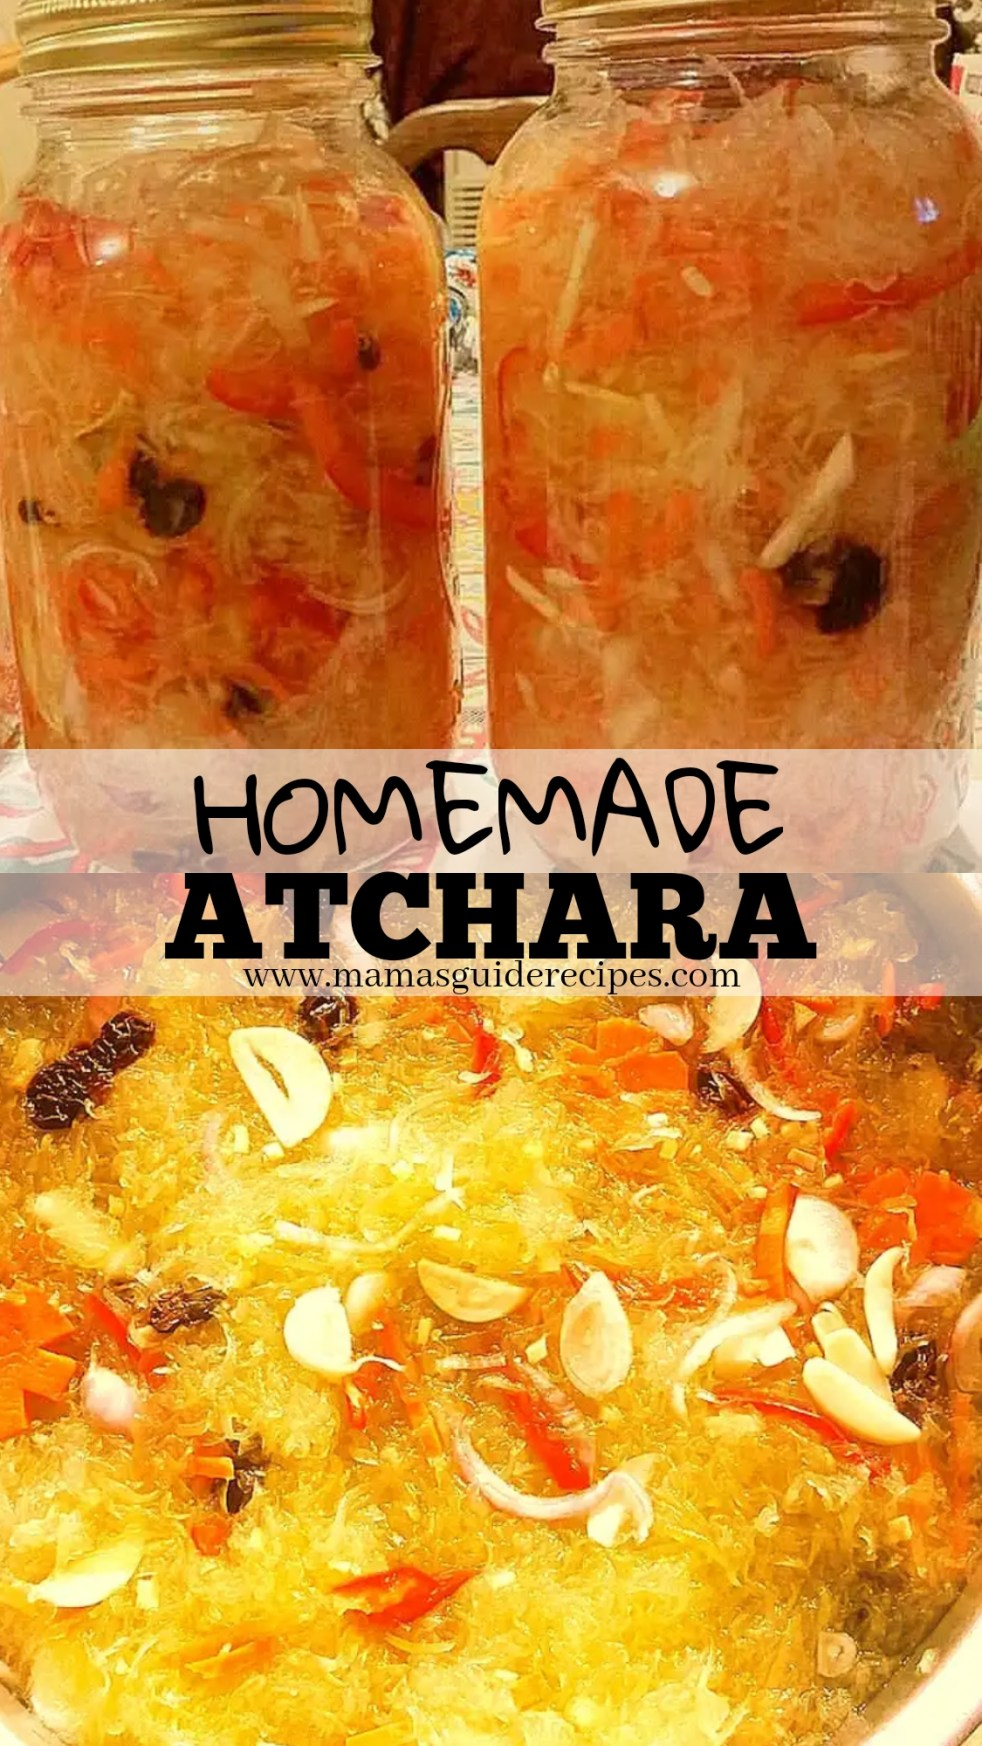 HOMEMADE ATCHARA